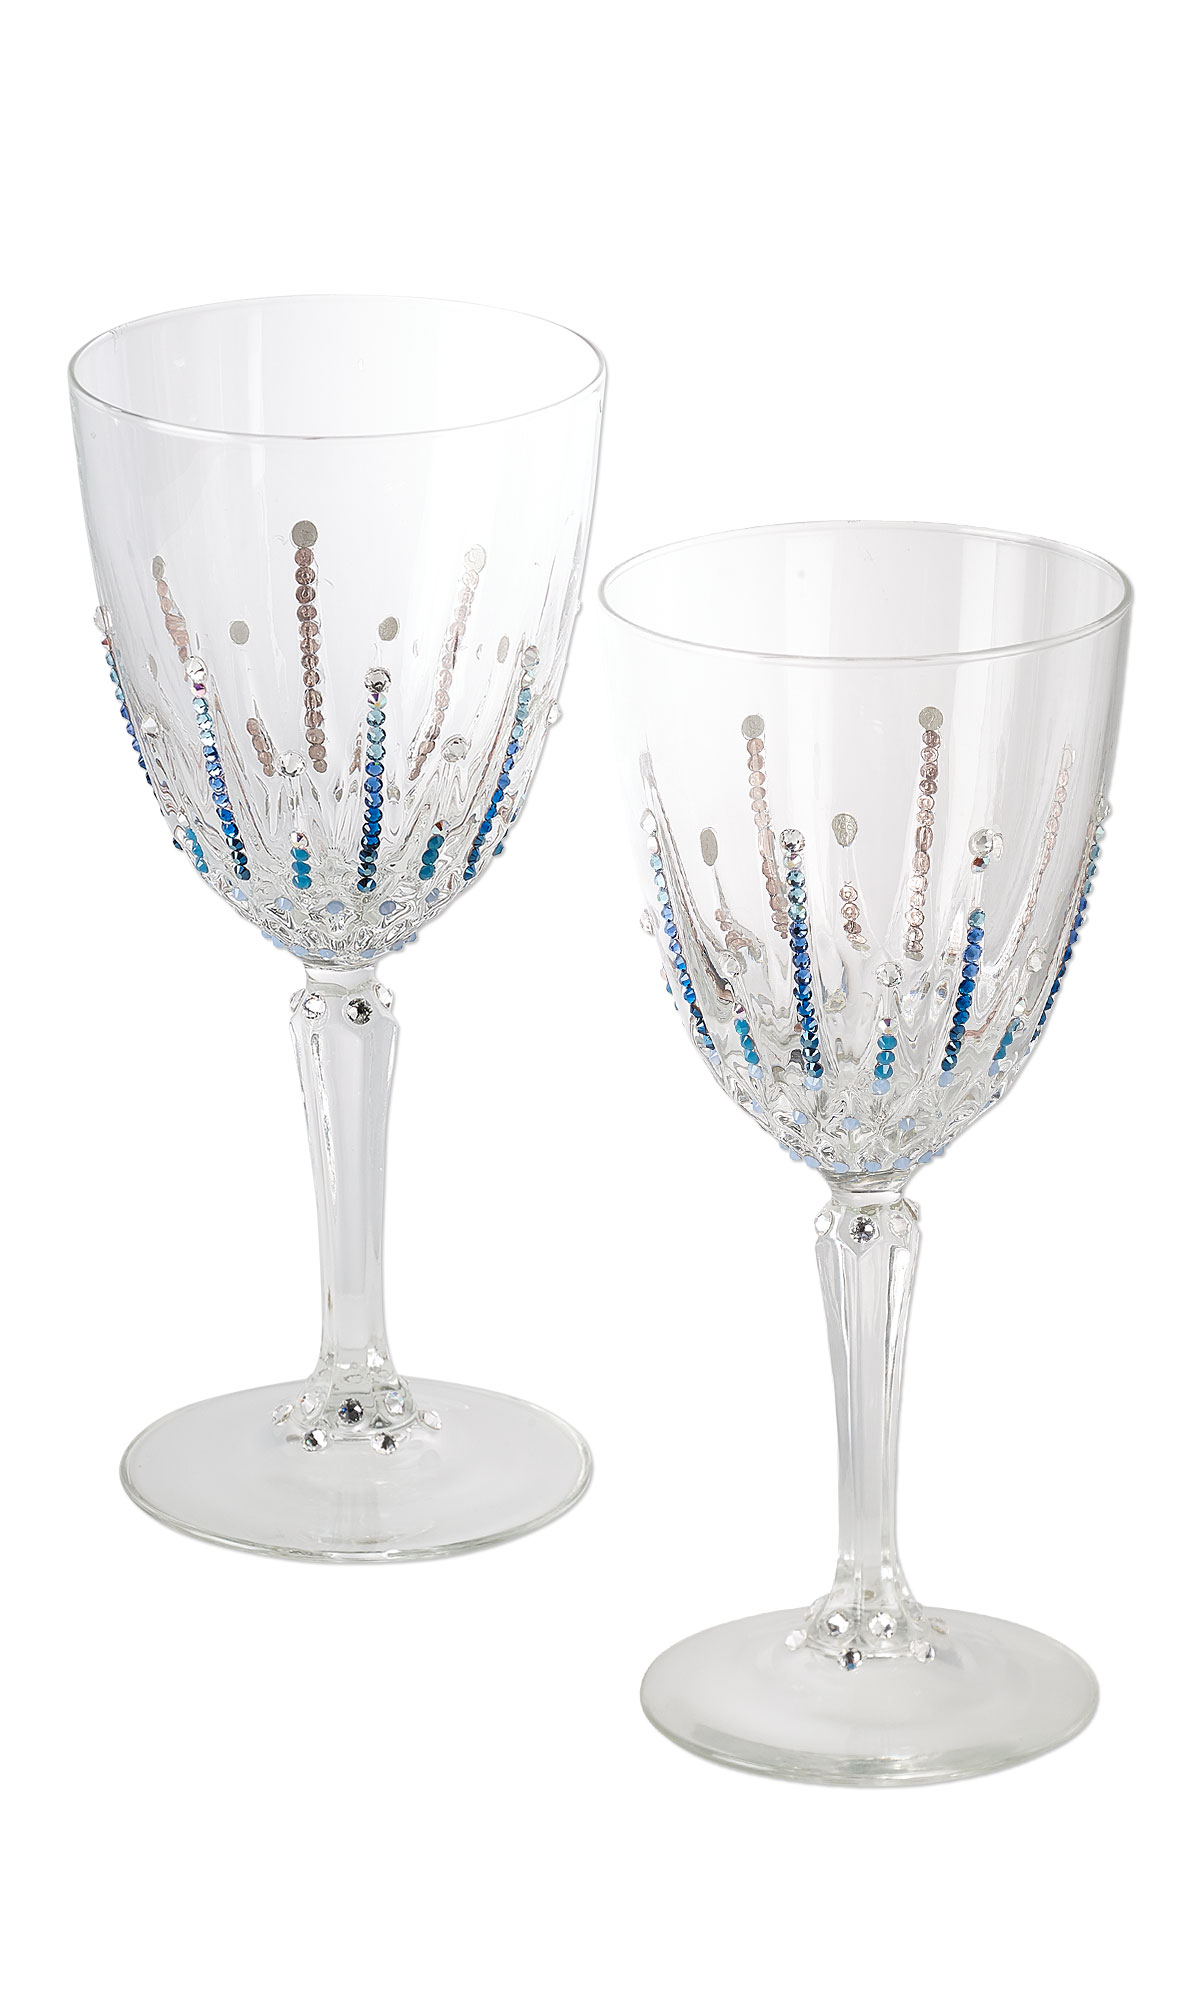 Jewelry design wine glass with swarovski crystals fire mountain gems and beads - Swarovski stemware ...